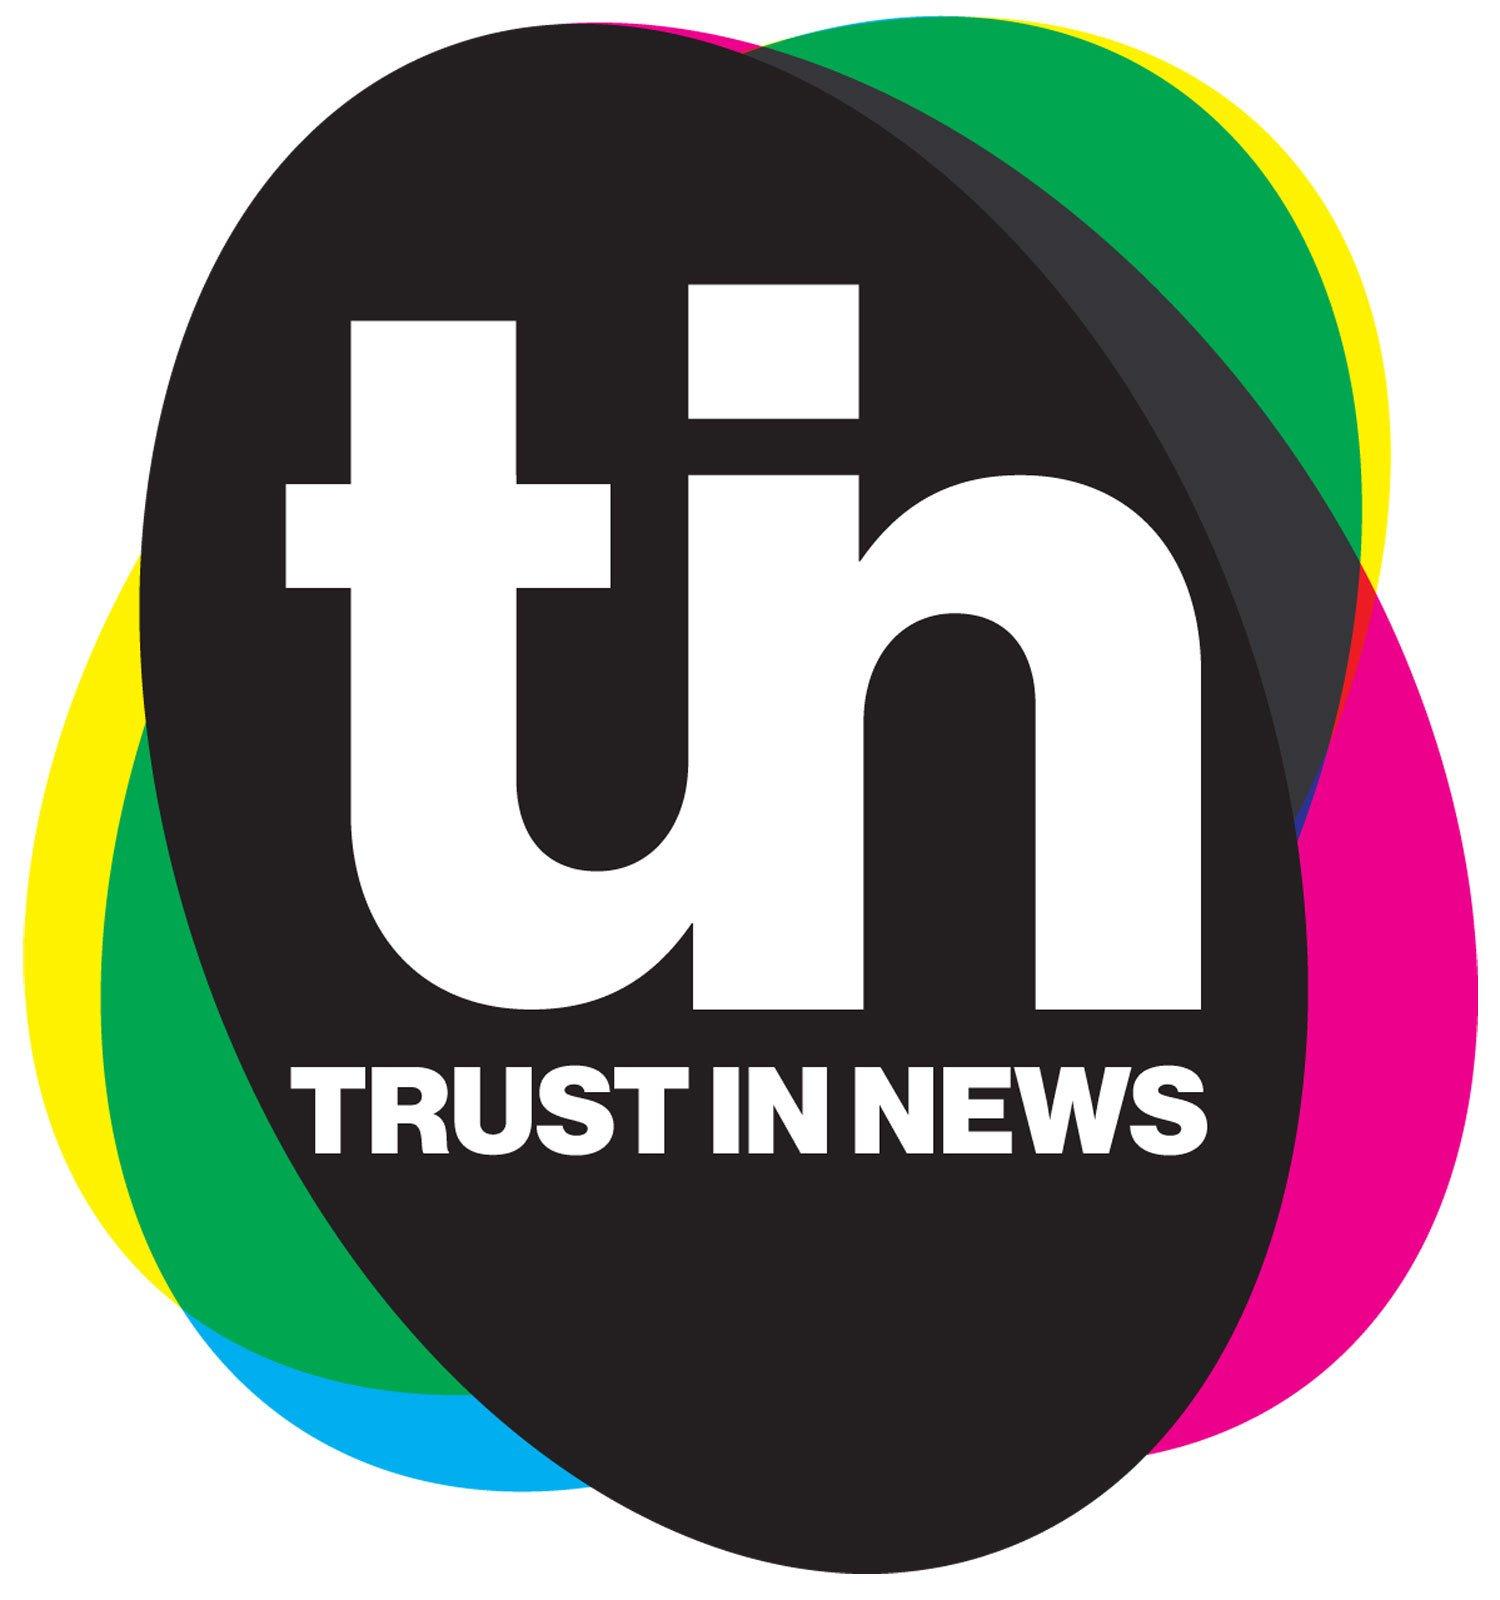 Logo Trust in News.jpg